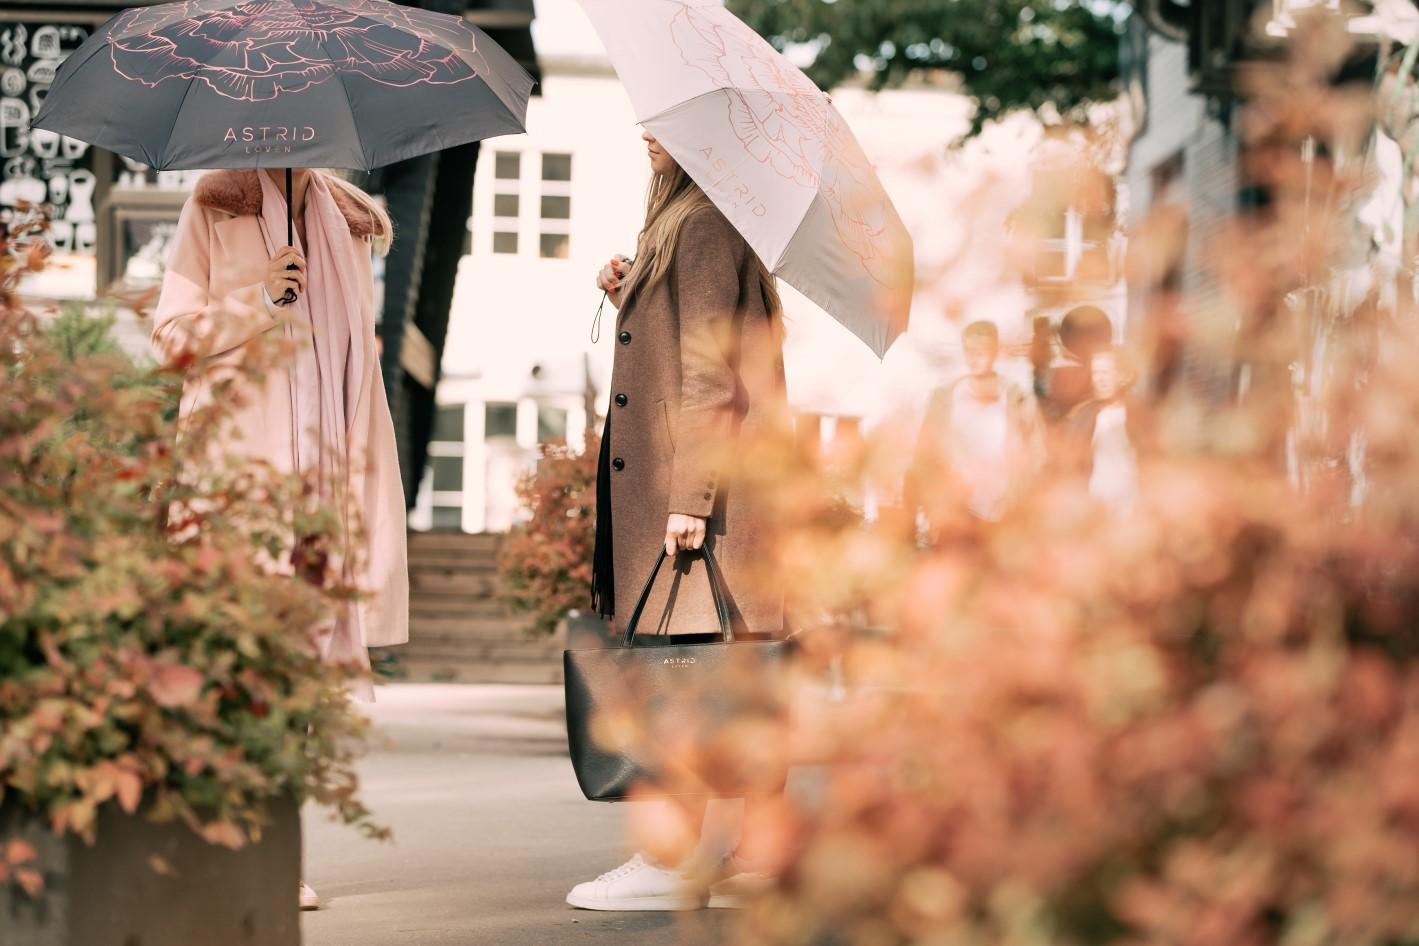 Astrid Loven quality umbrellas